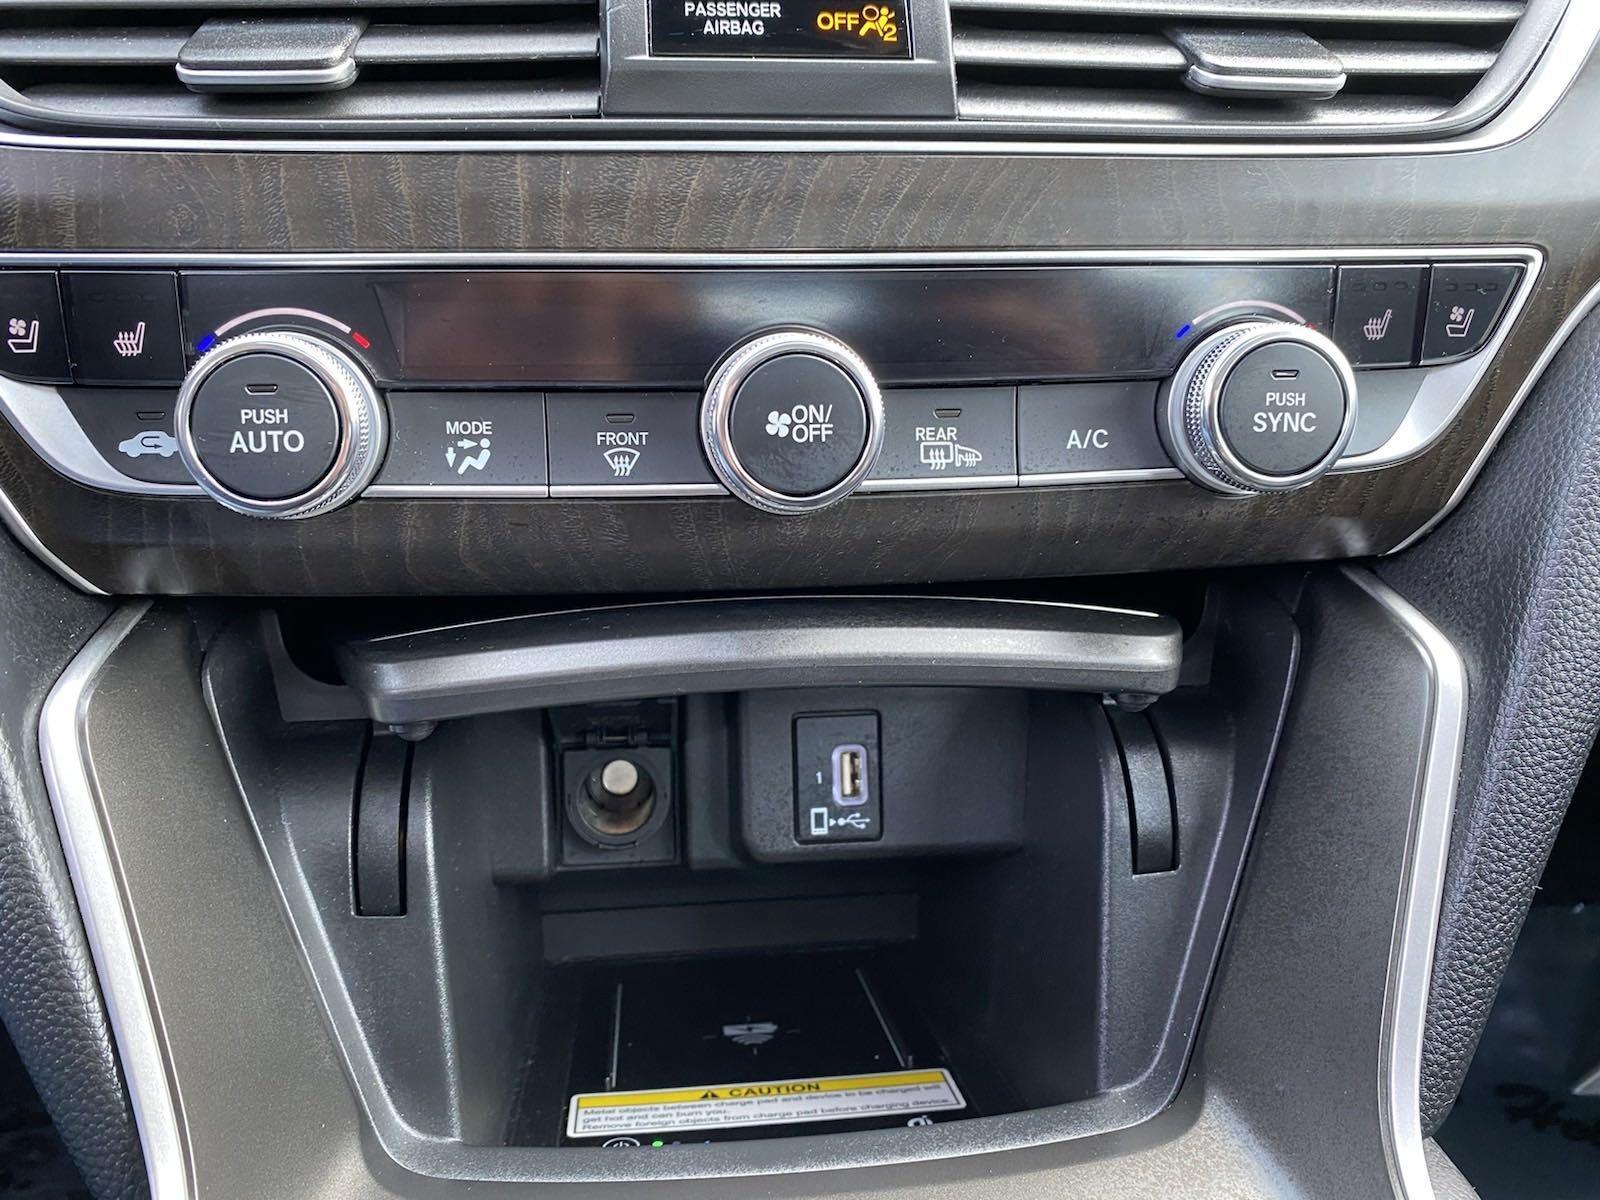 Used-2018-Honda-Accord-Sedan-Touring-20T